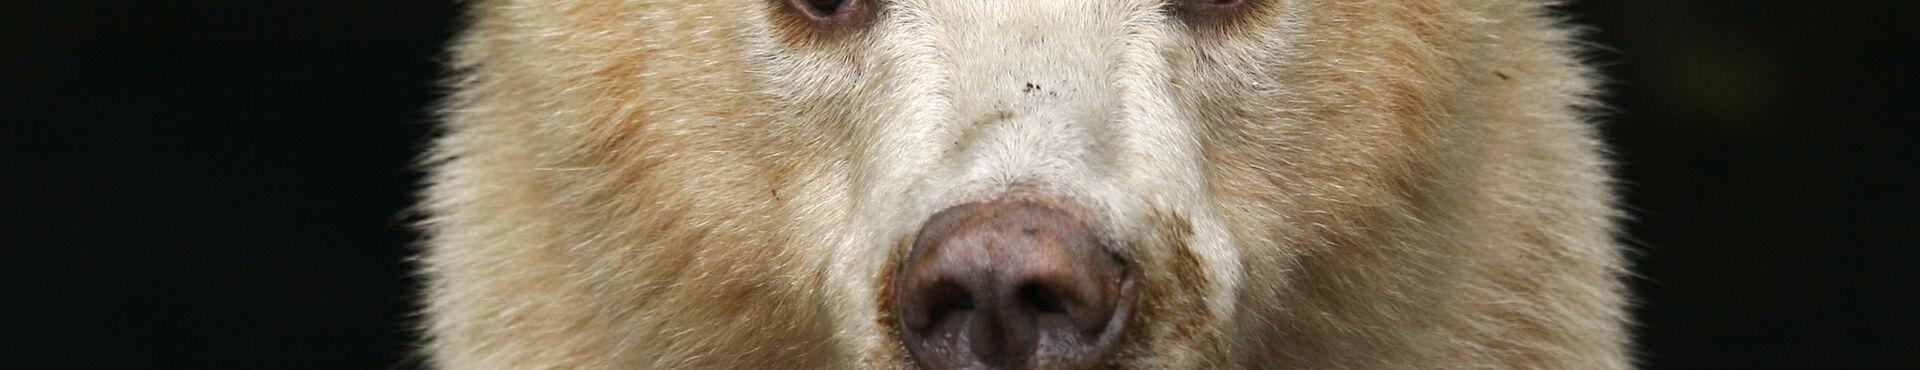 Banner - Spirit Bear Research Foundation